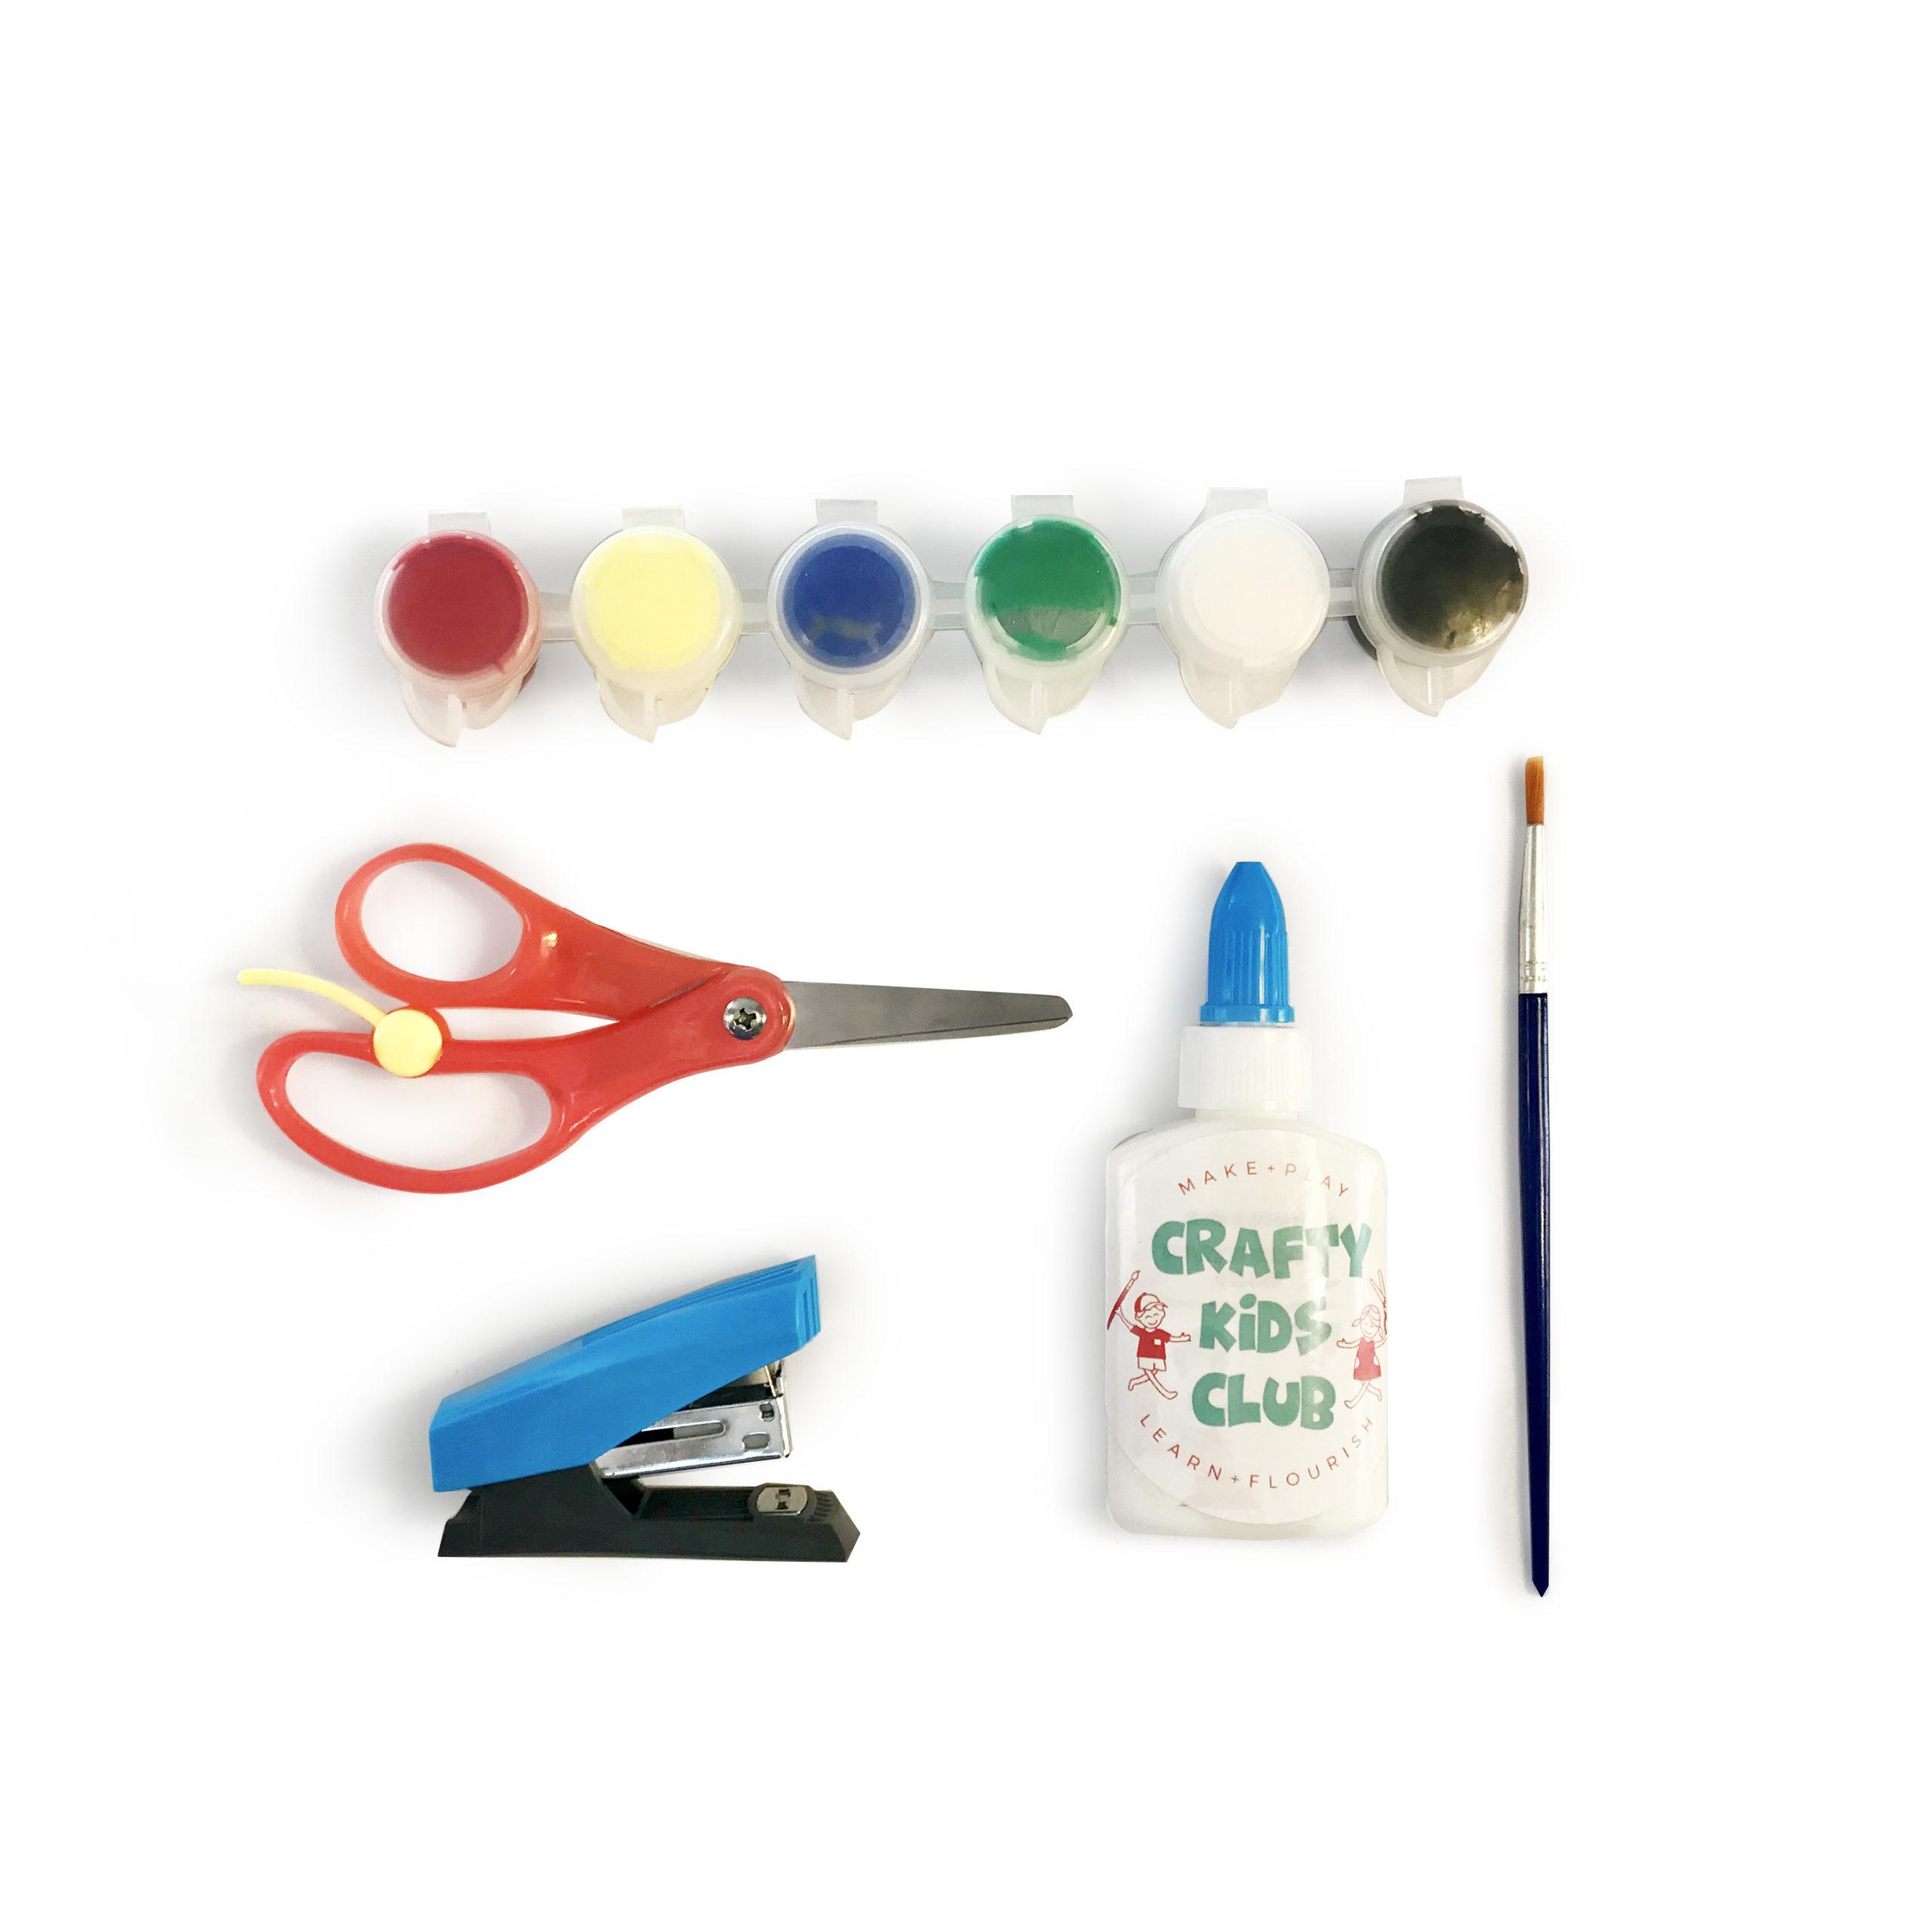 Cambodia craft kit contents